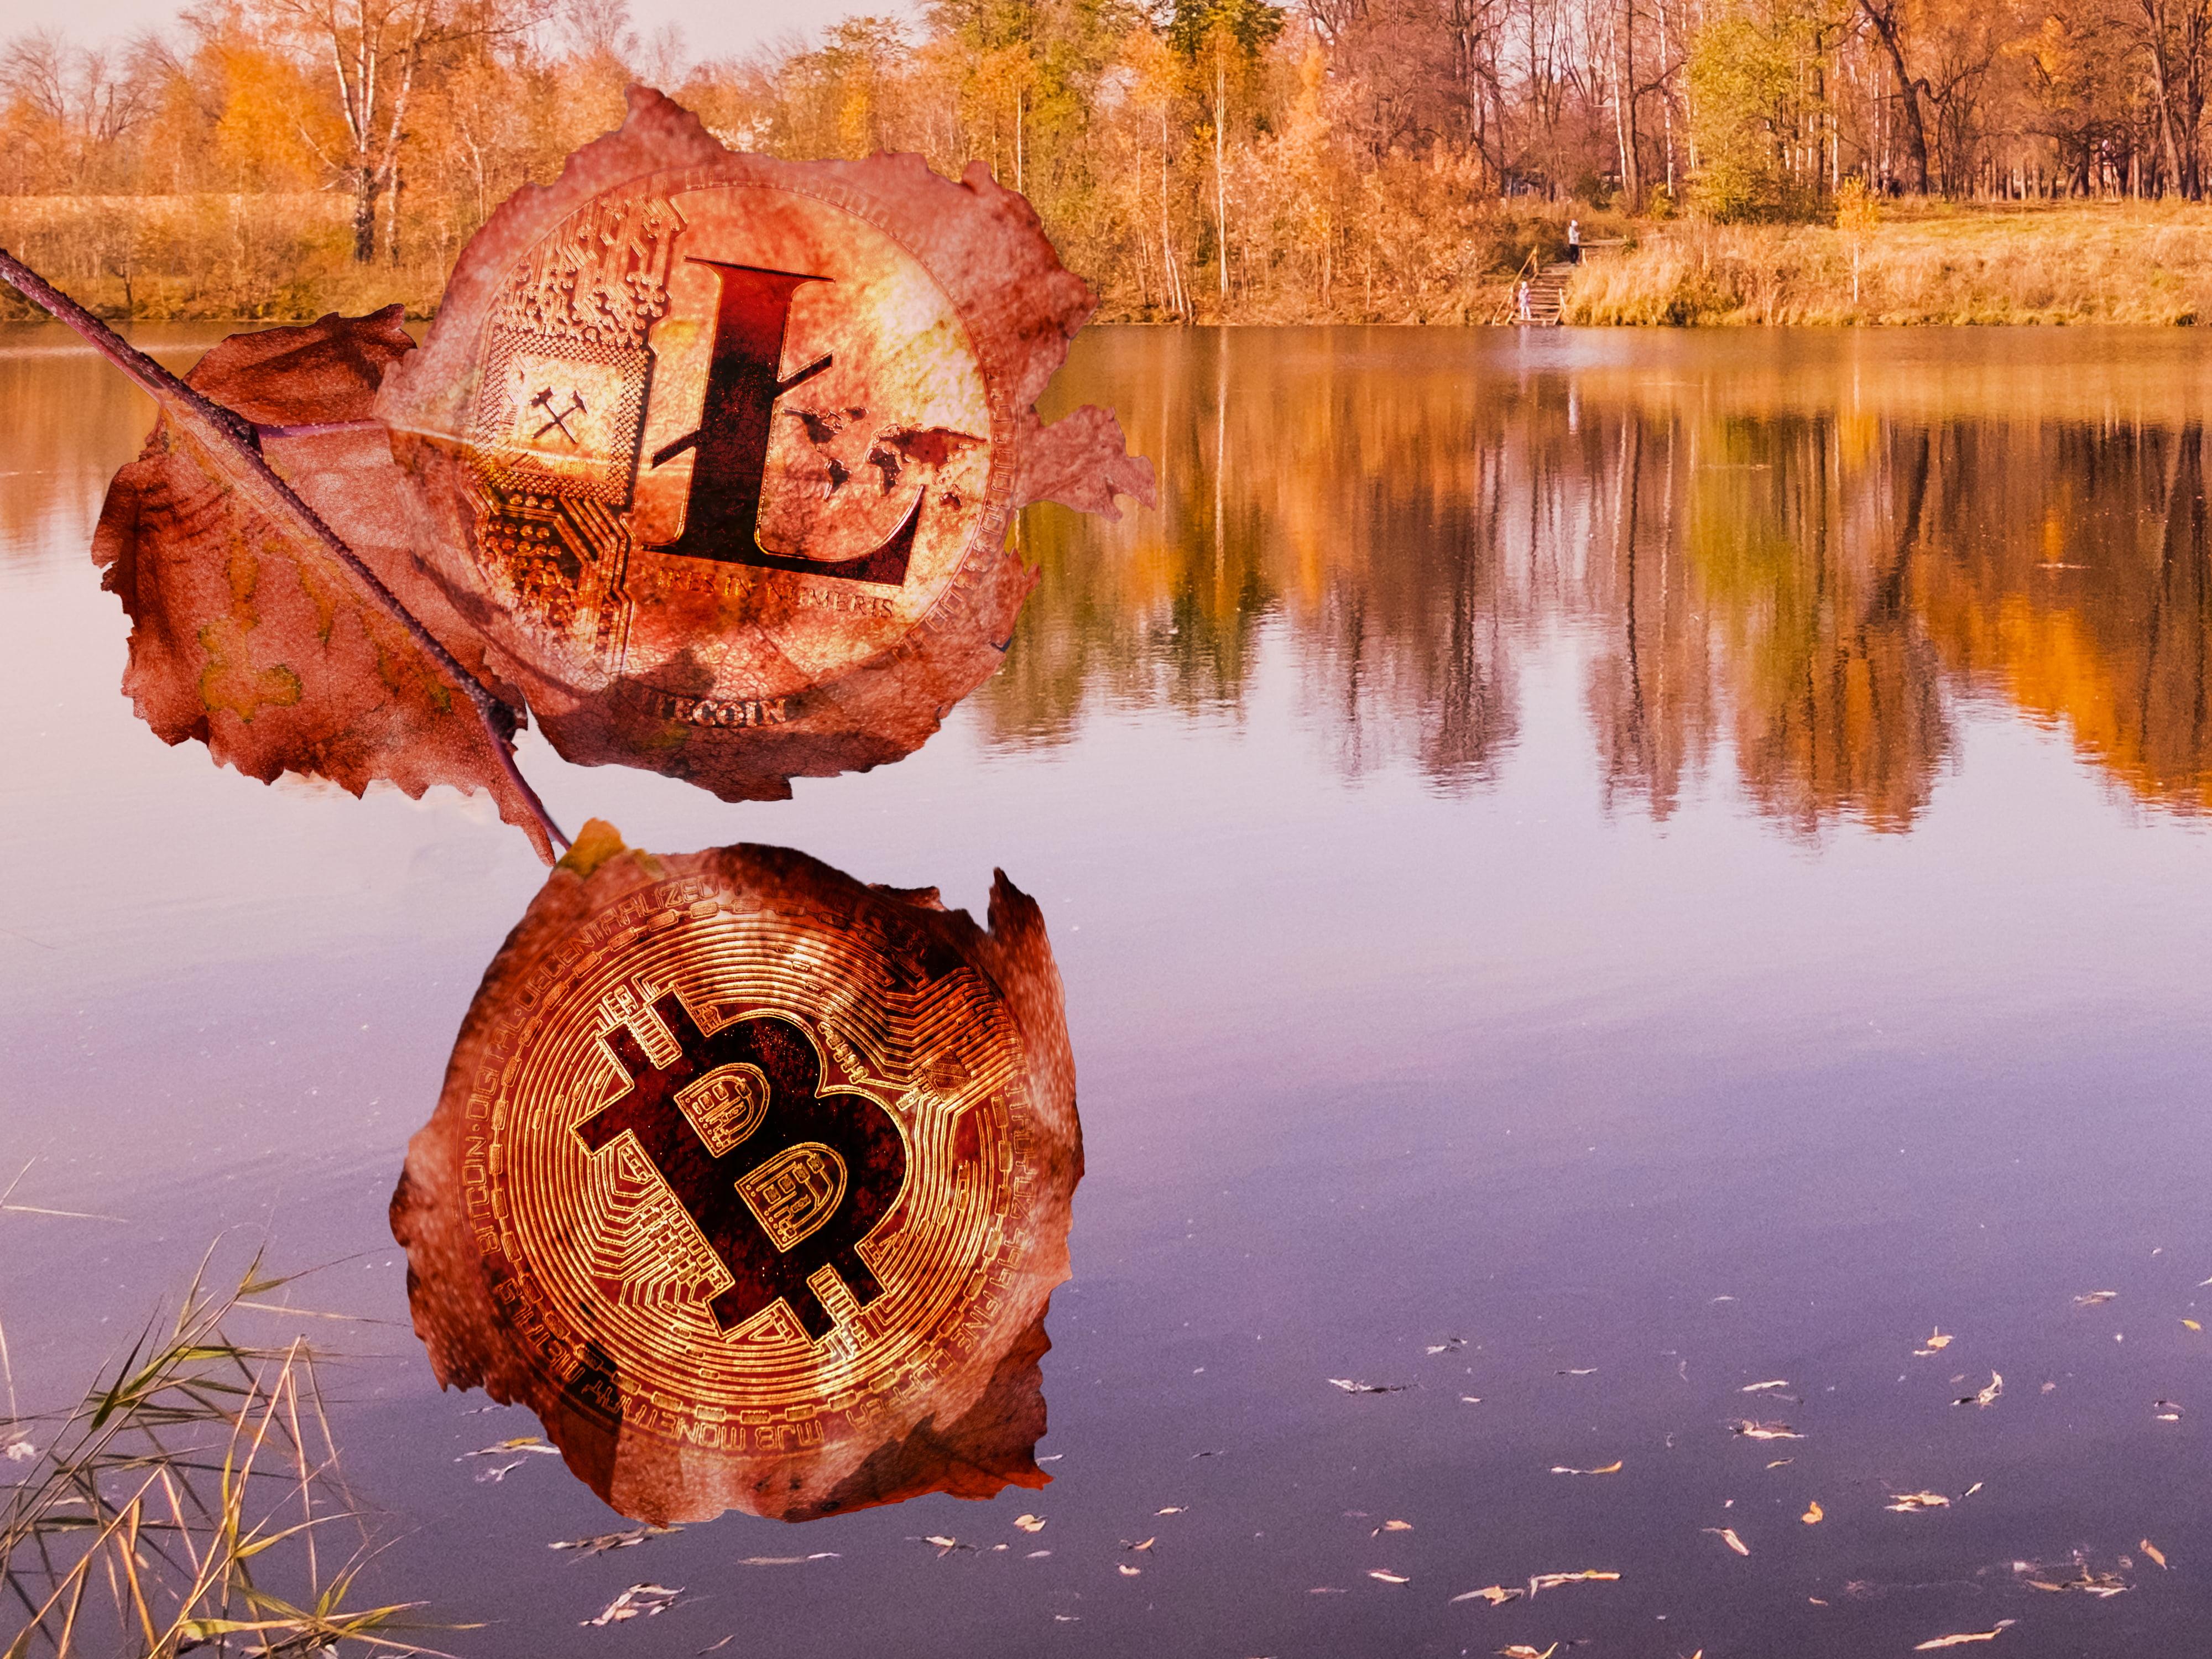 ethereum xrp litecoin bitcoin altcoin alt season crypto